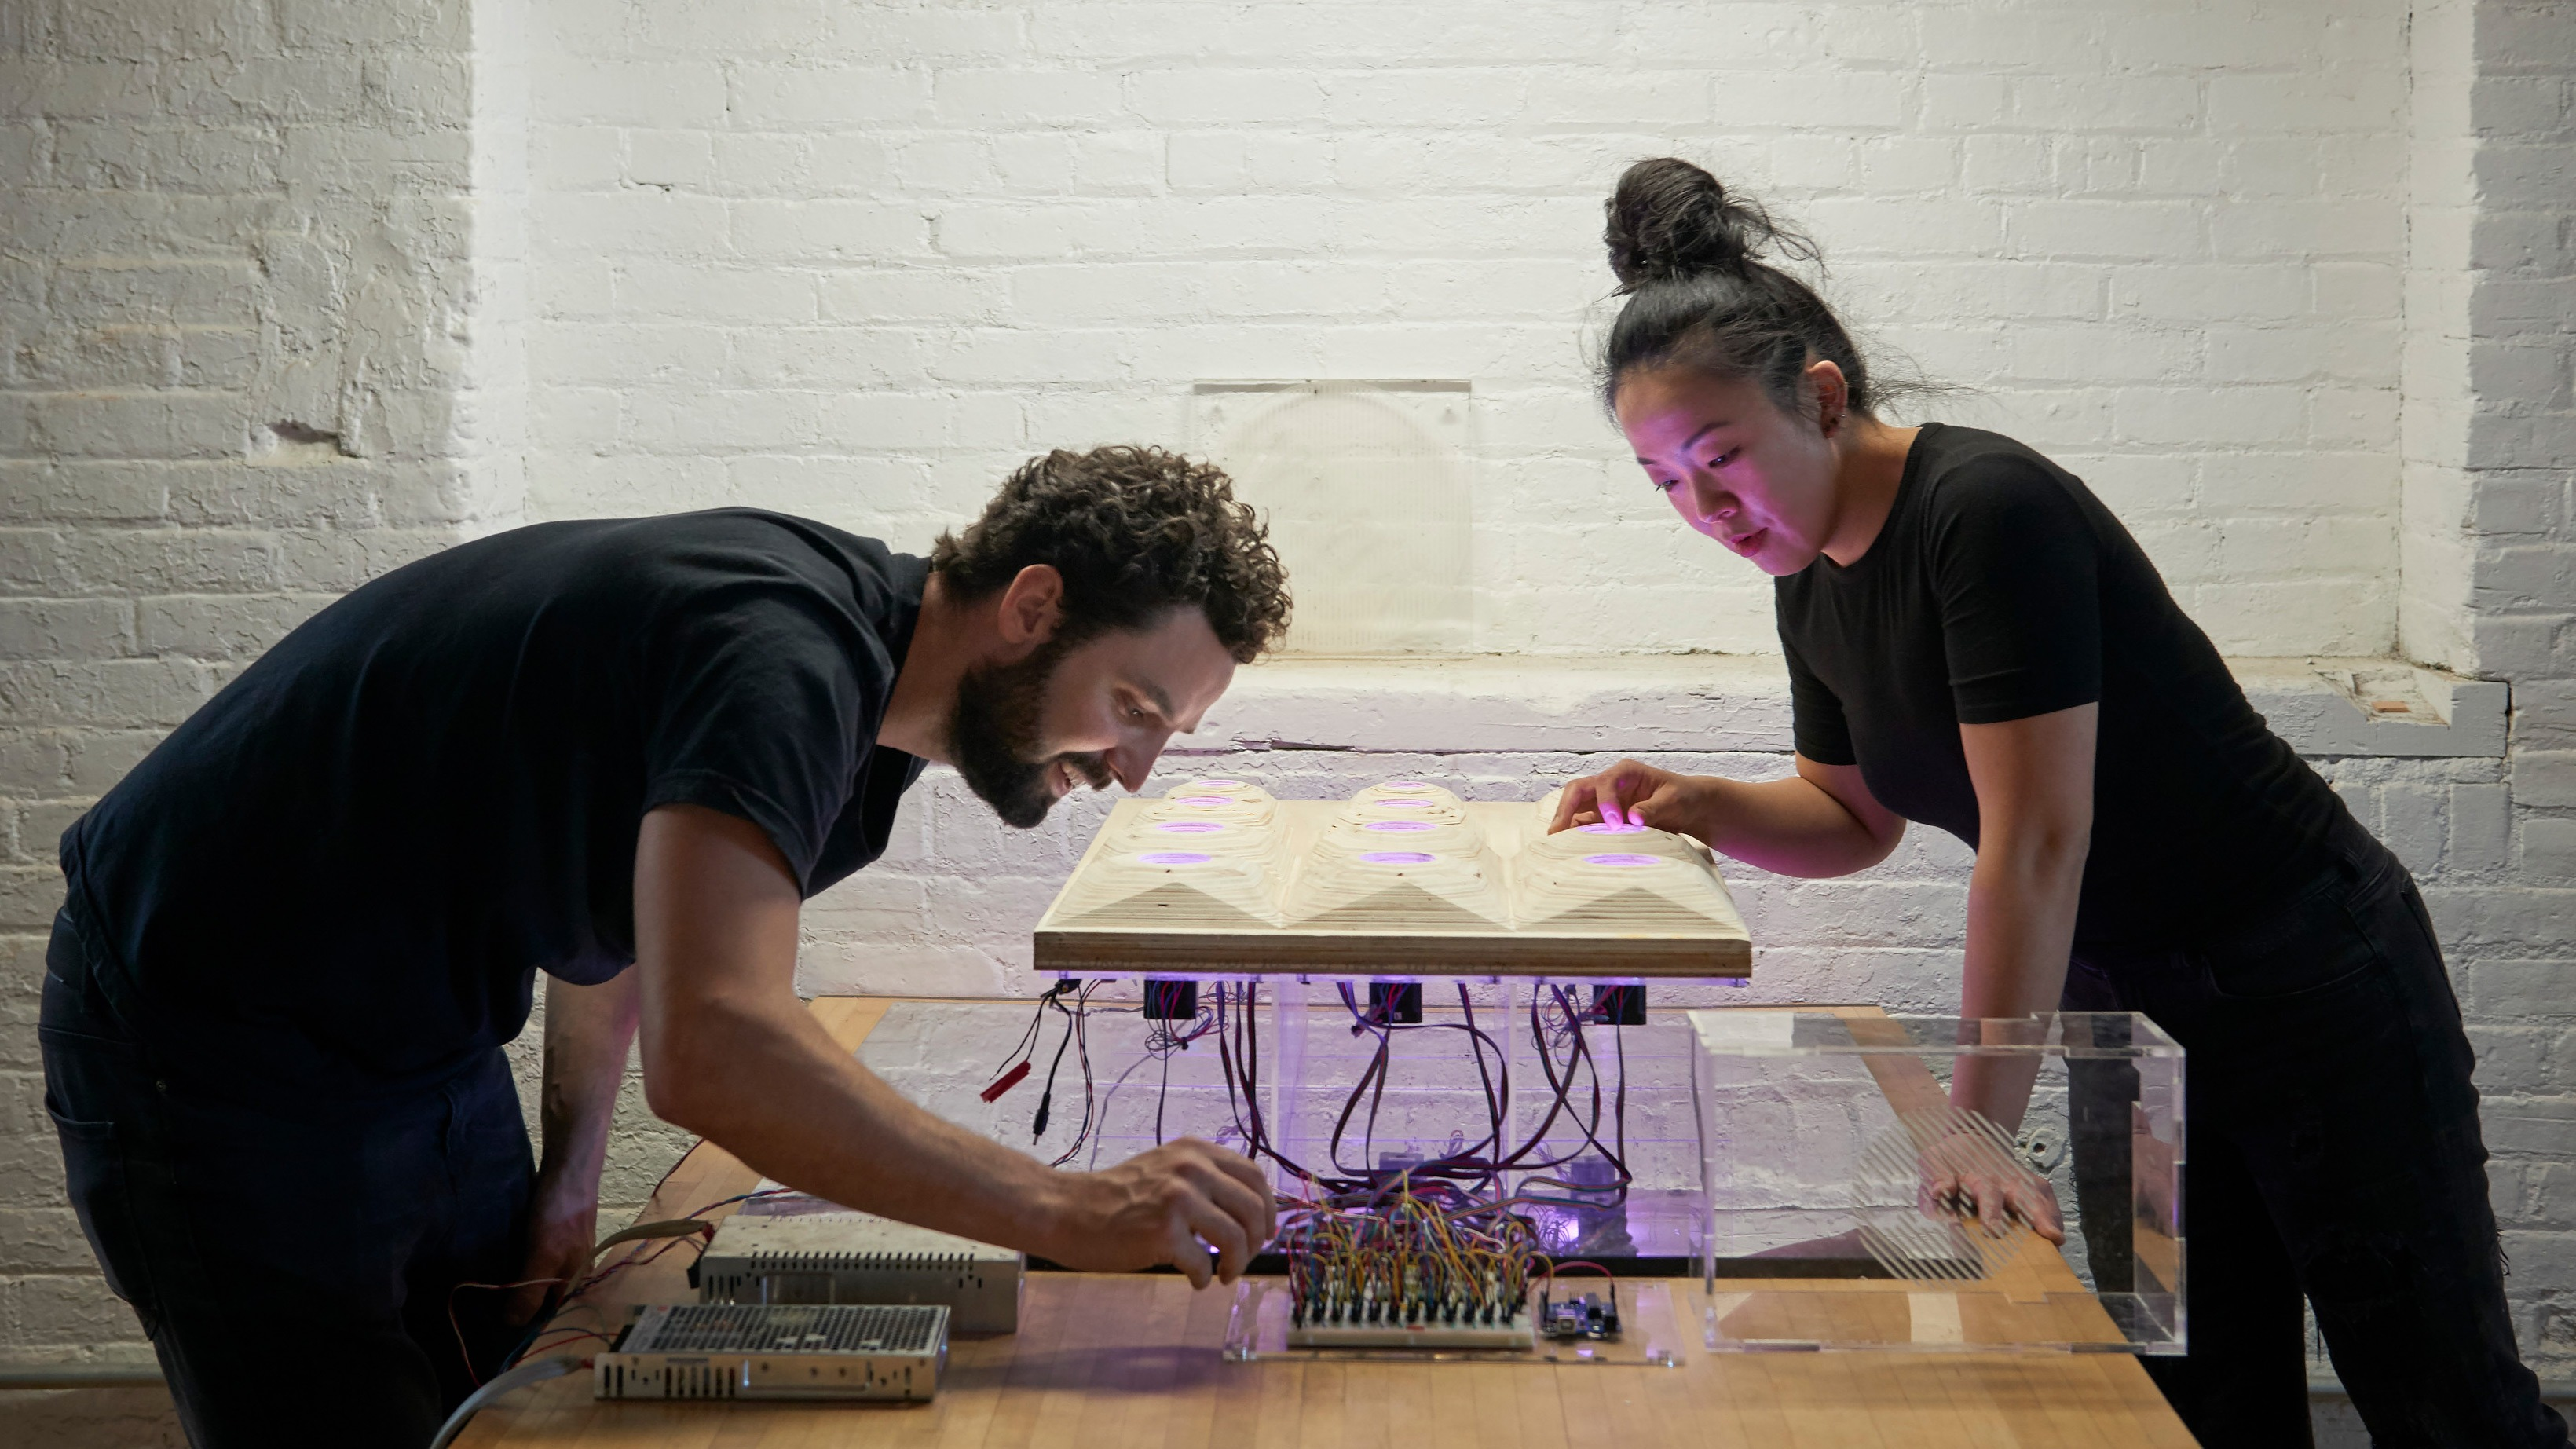 Students wiring an electronic illuminated art piece